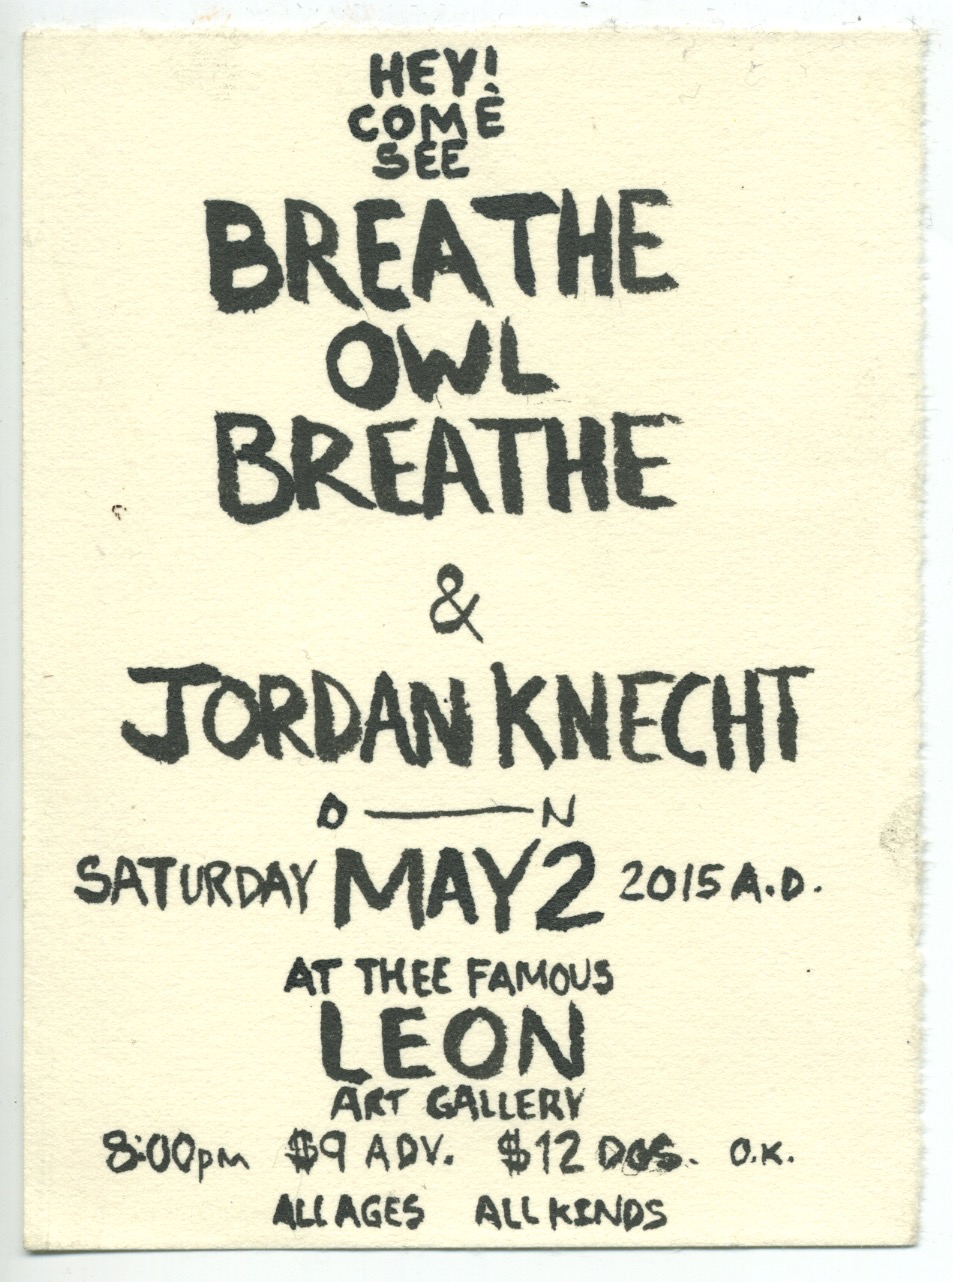 Breathe Owl Breathe Flier.jpeg